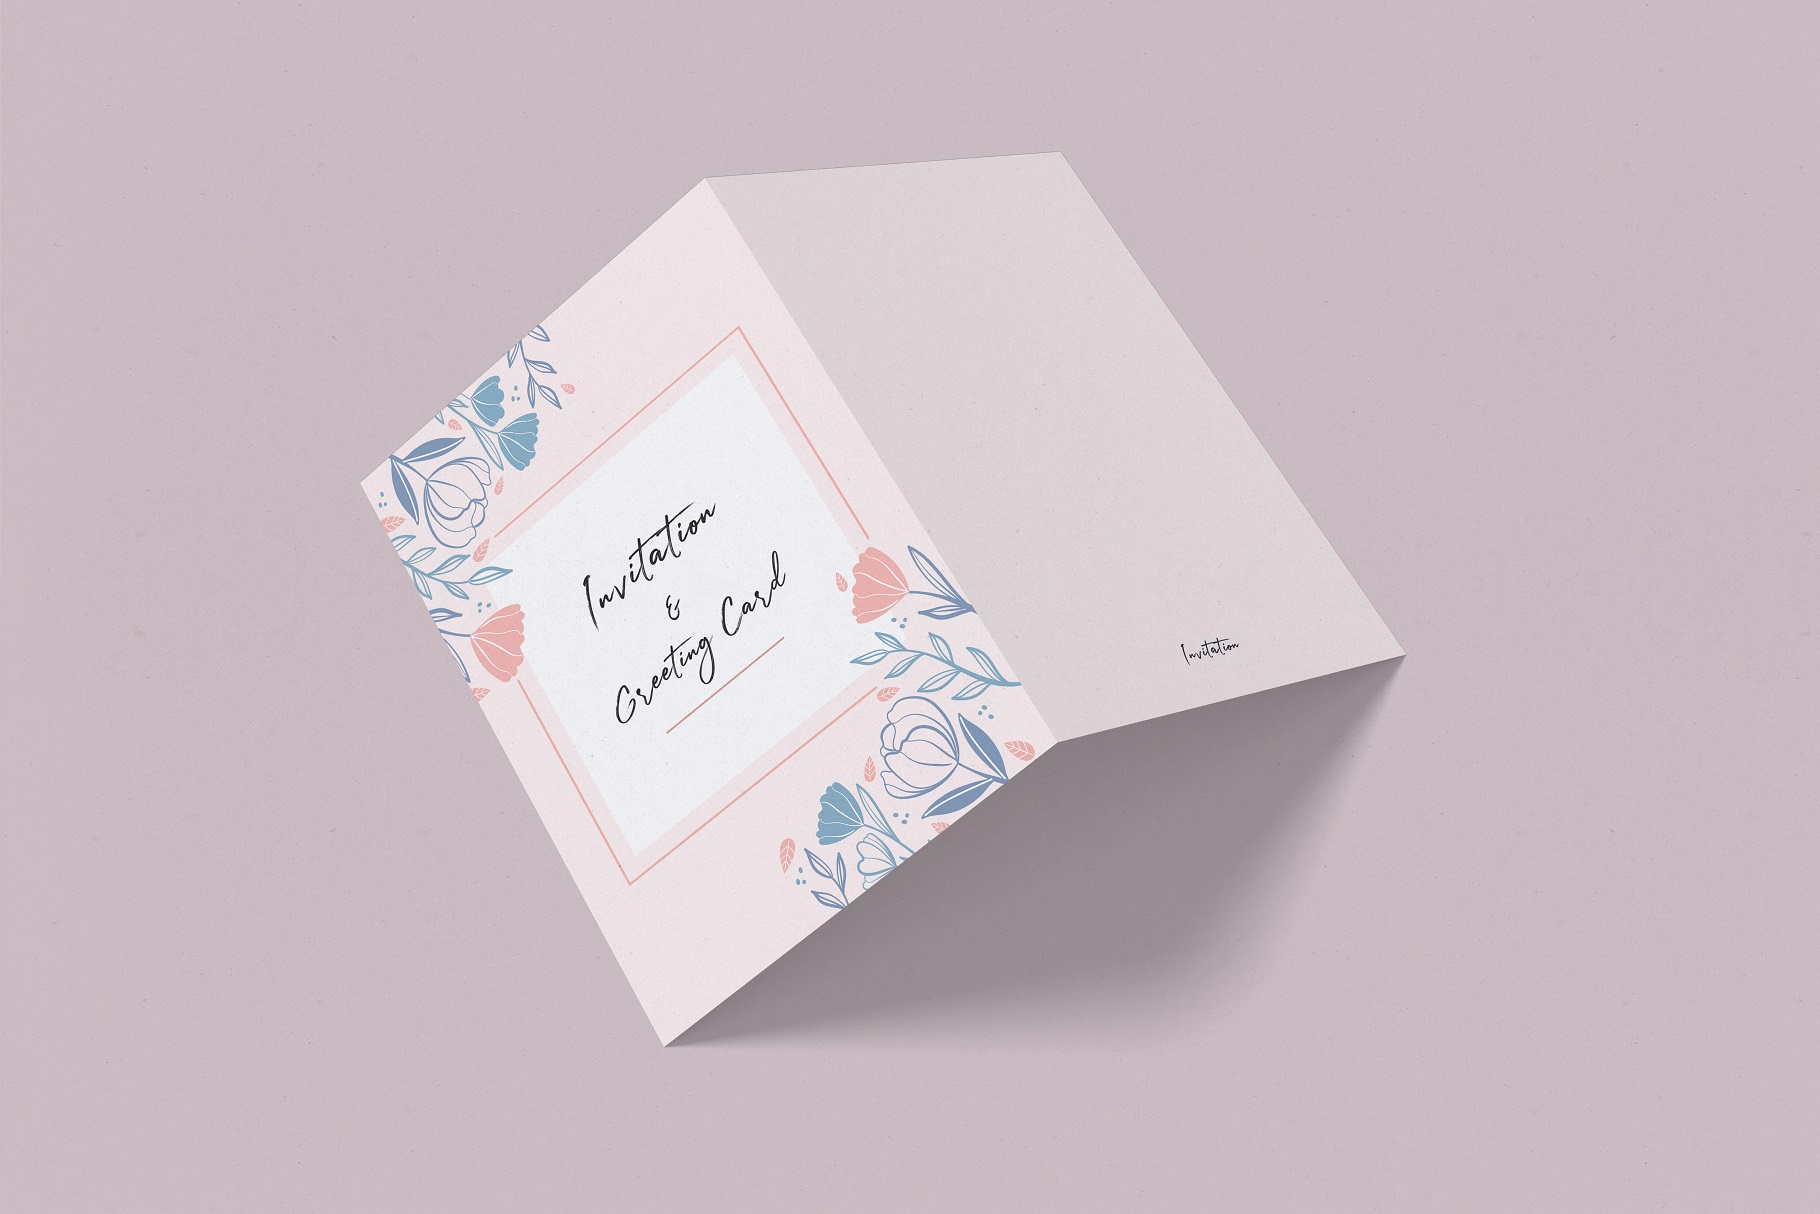 Invitation & Greeting Card Mockup example image 6